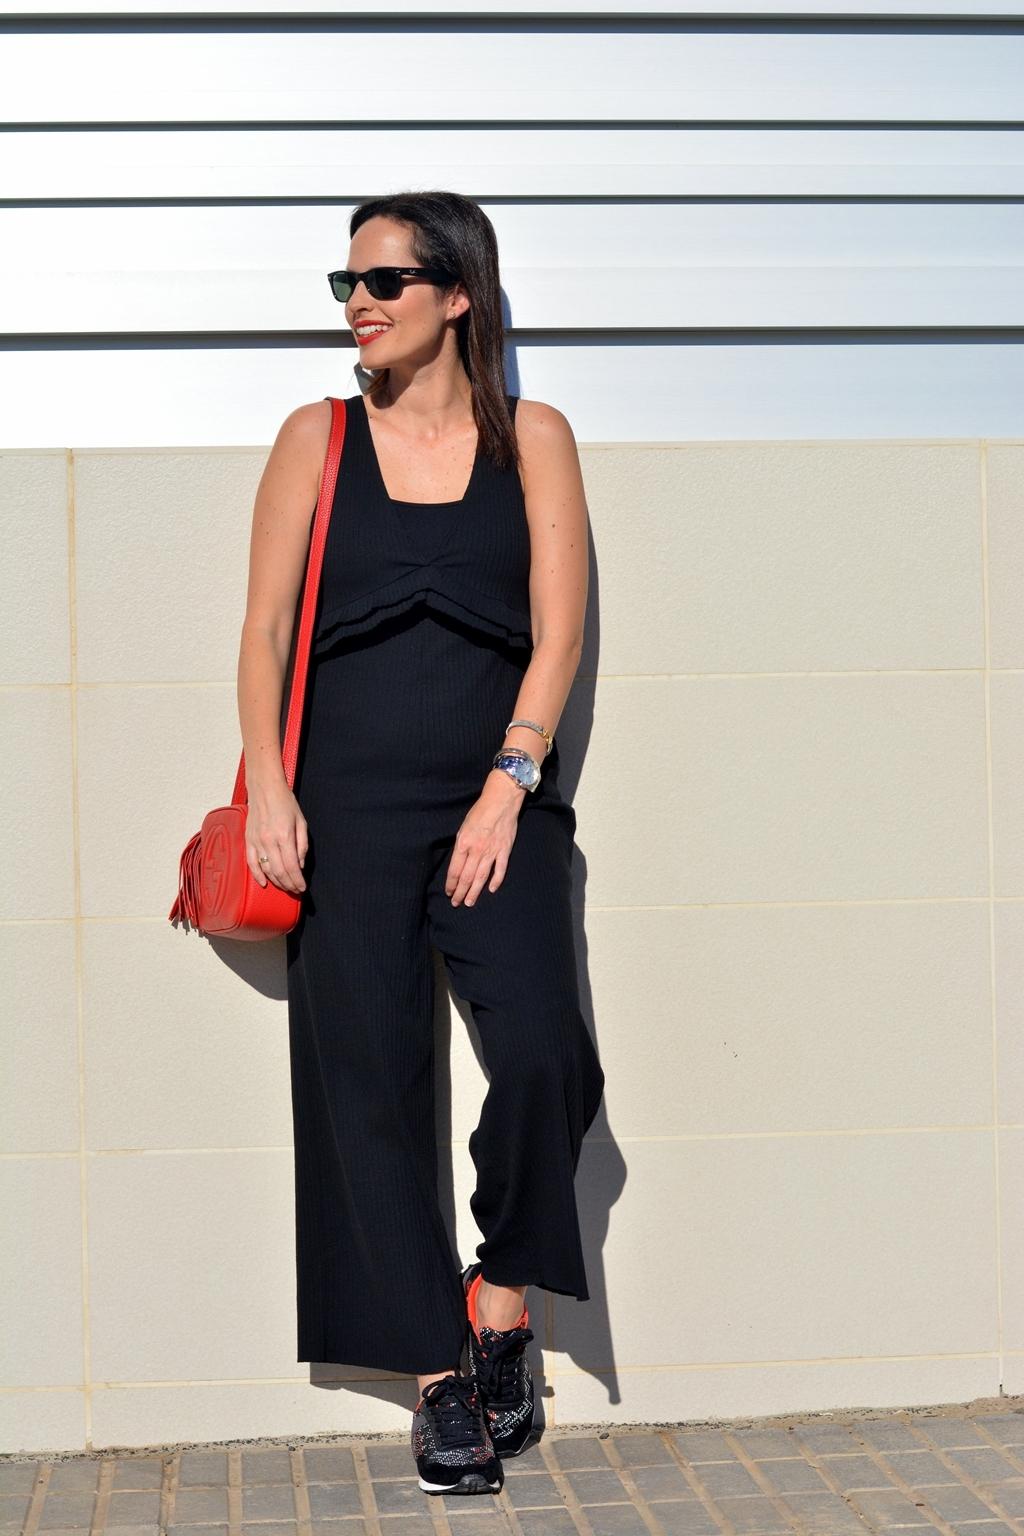 zara-black-jumpsuit-outfit